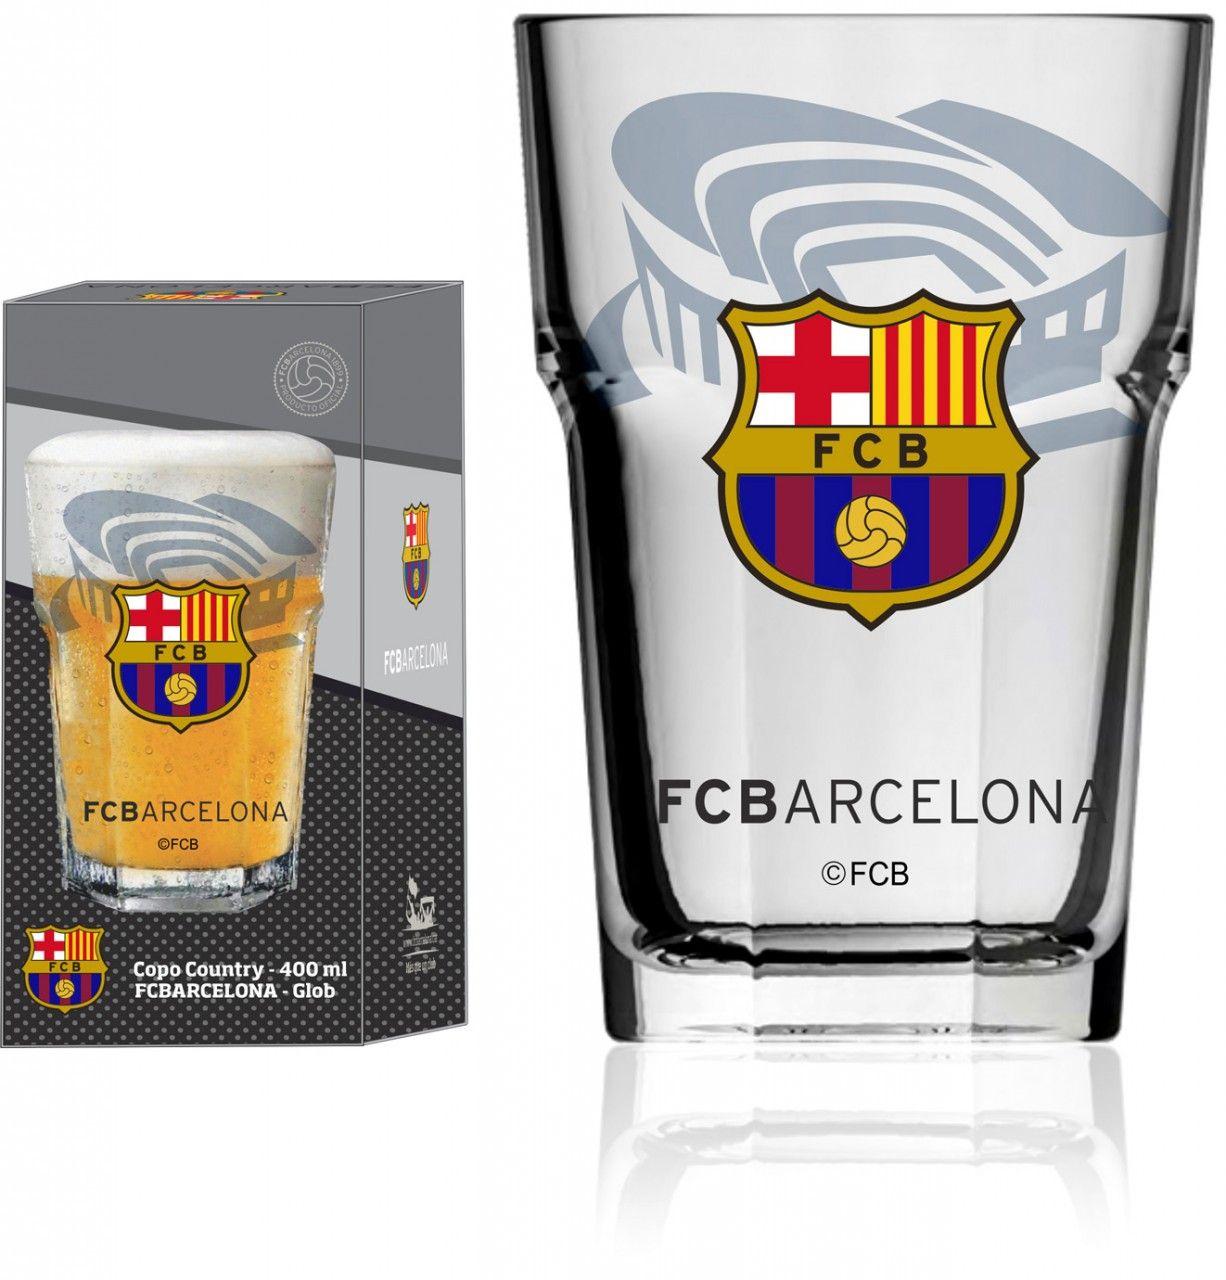 Copo Country Barcelona Estadio - 400ml